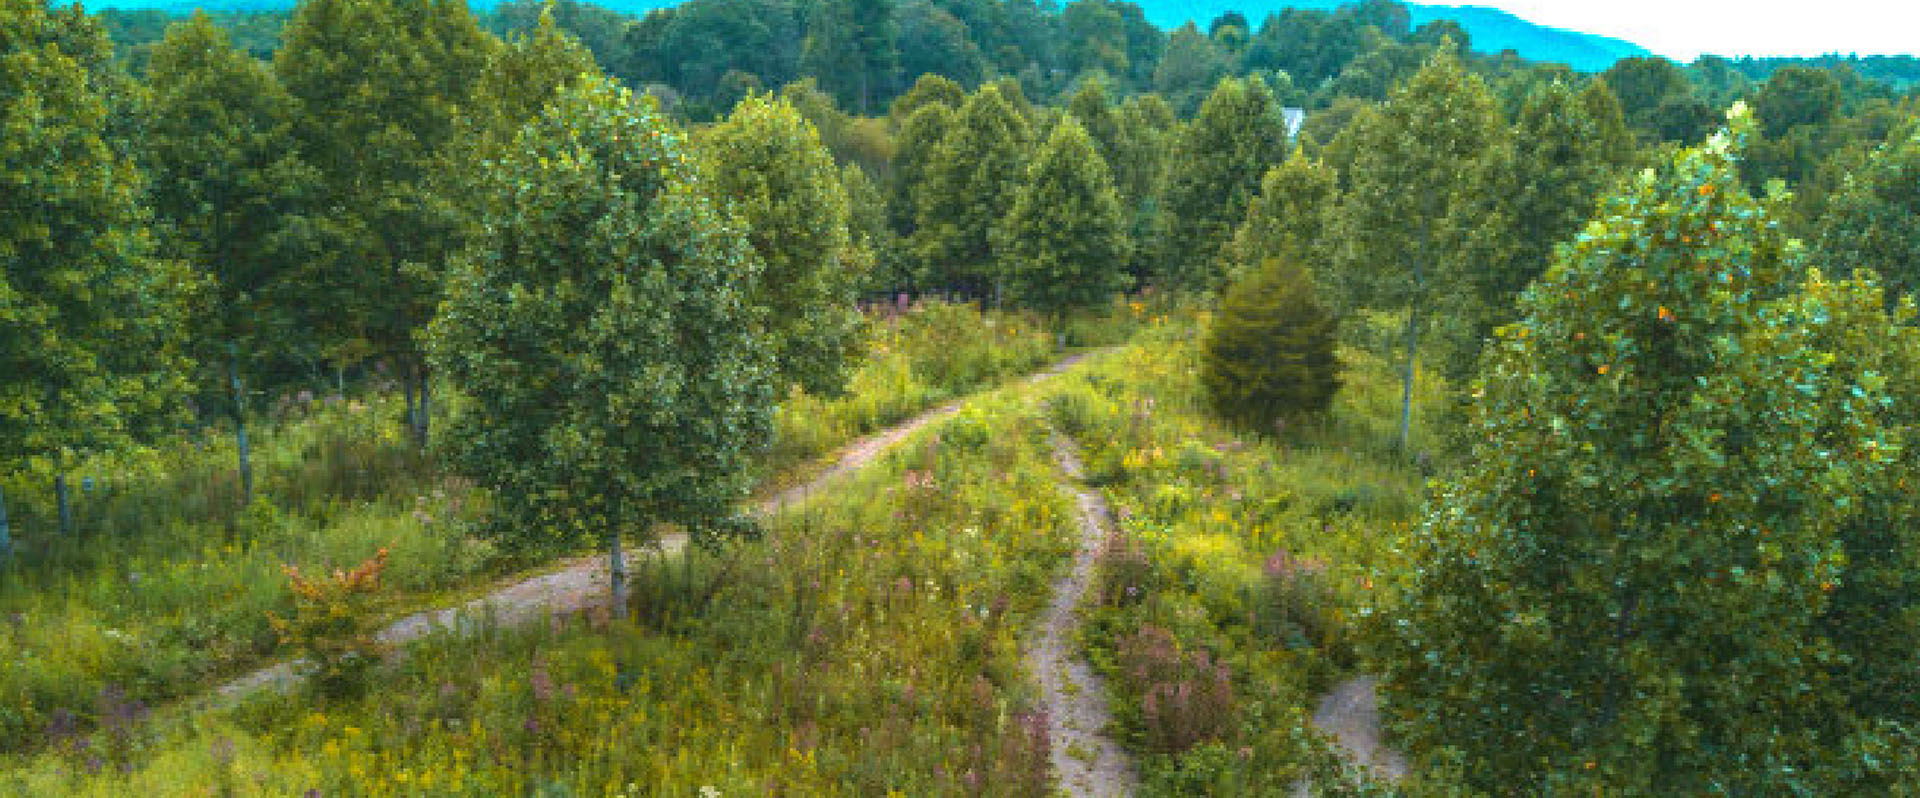 Natural burial ground in North Carolina, US.